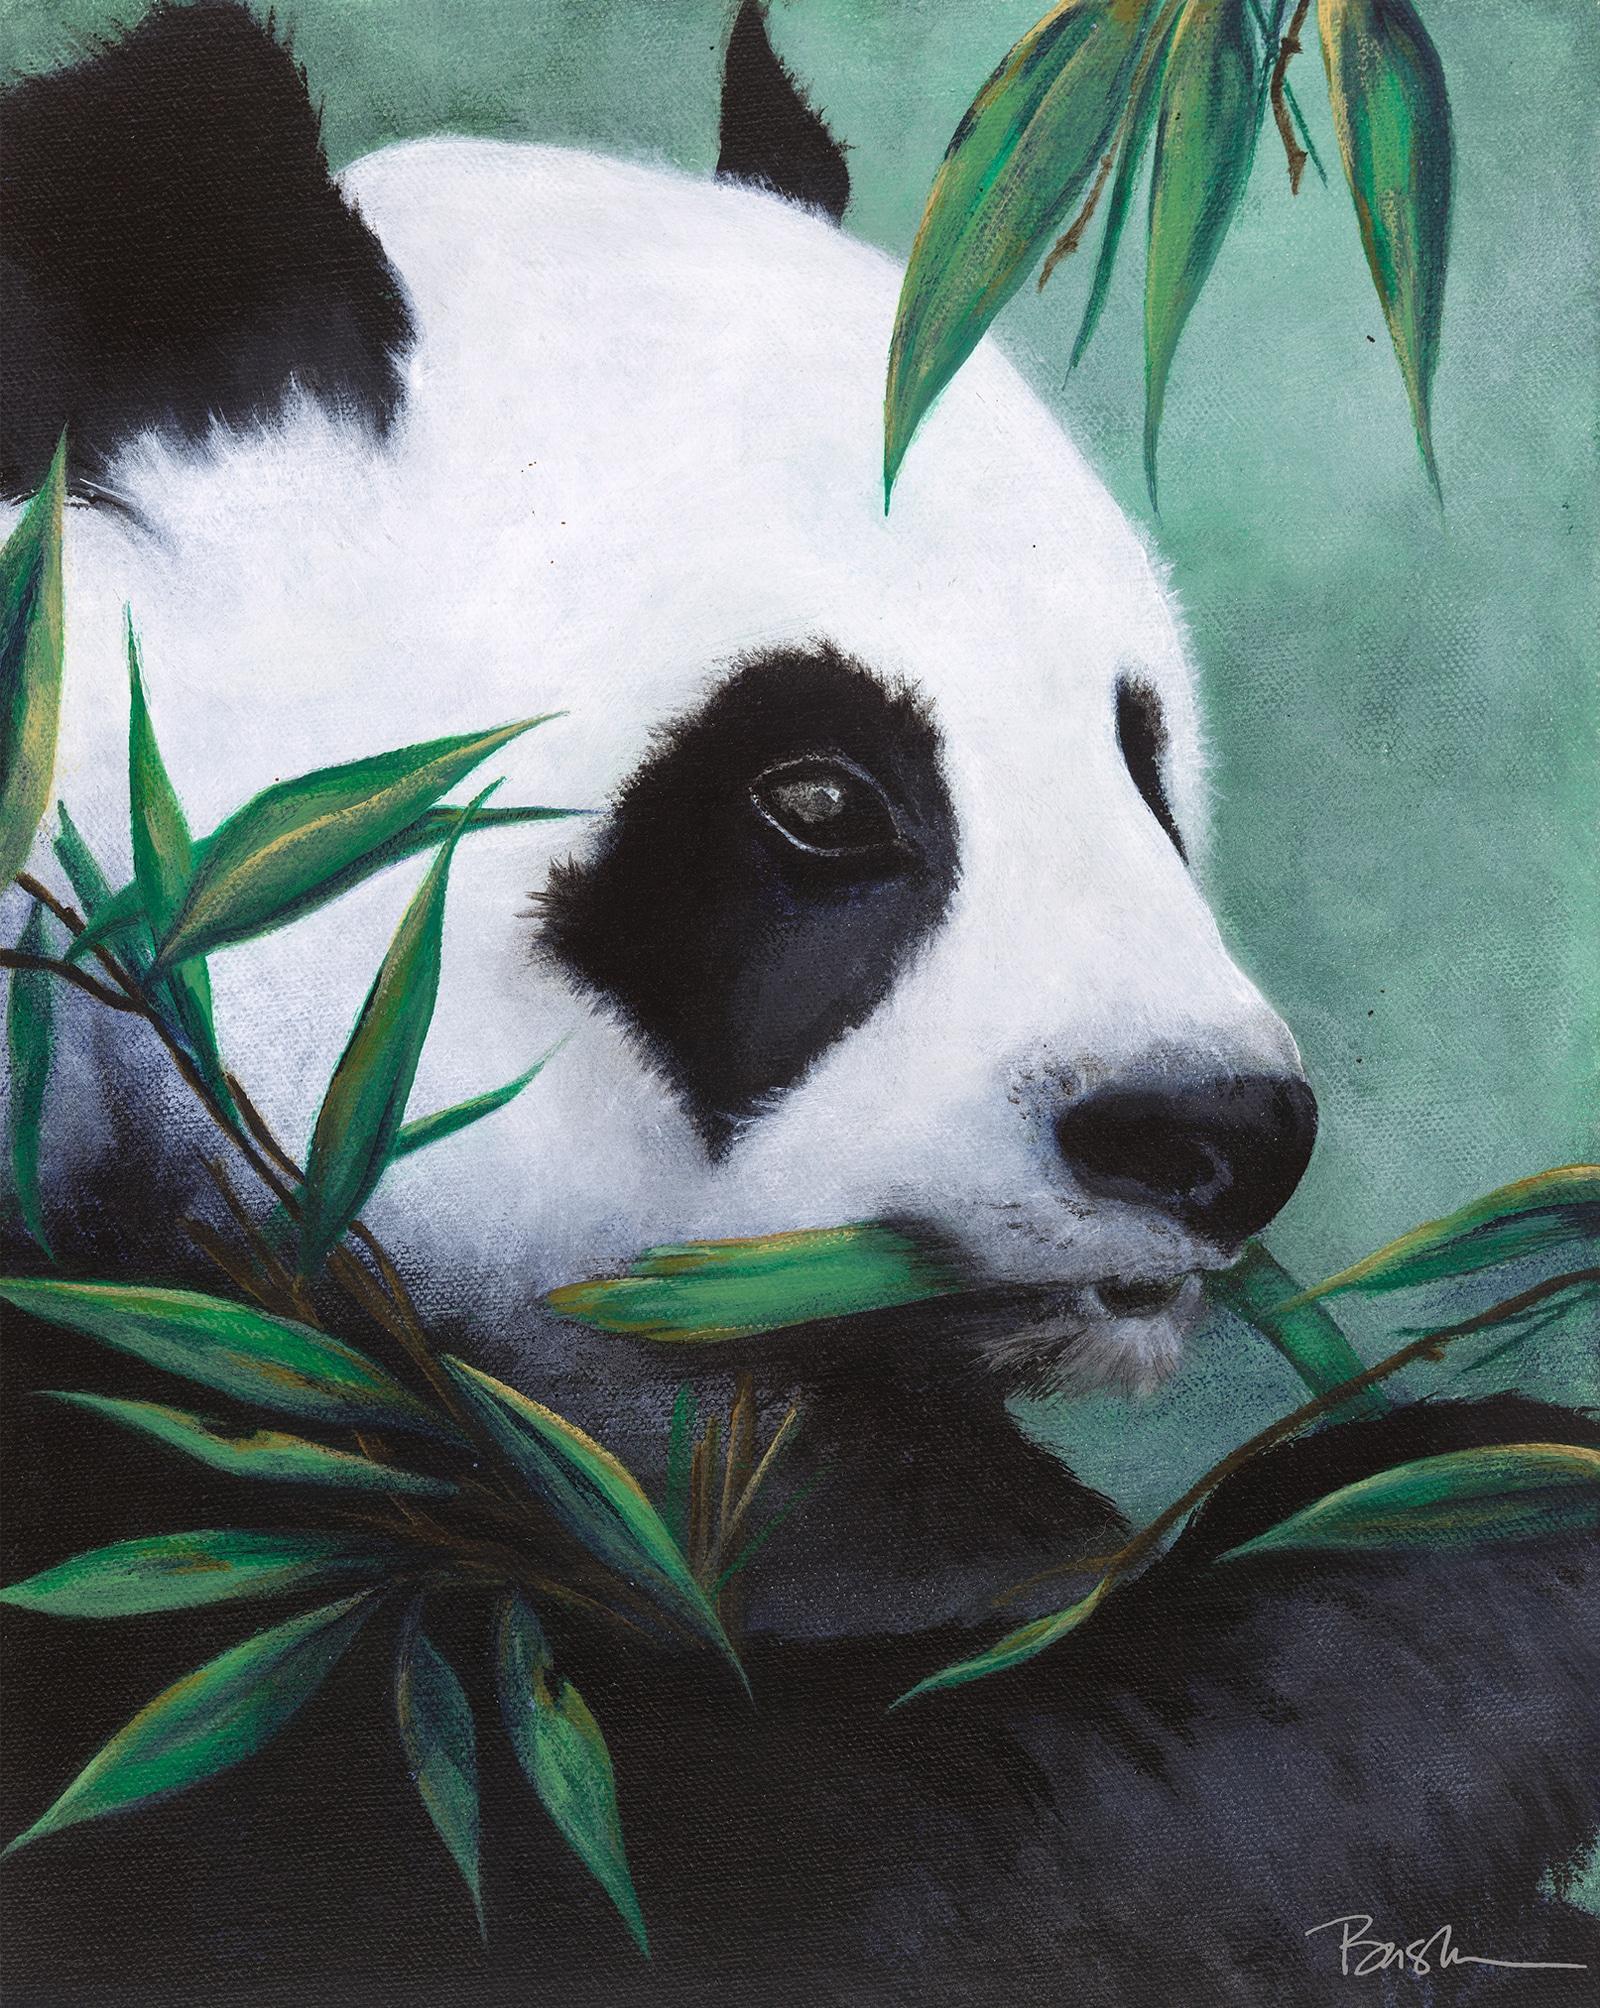 panda-laura-basha